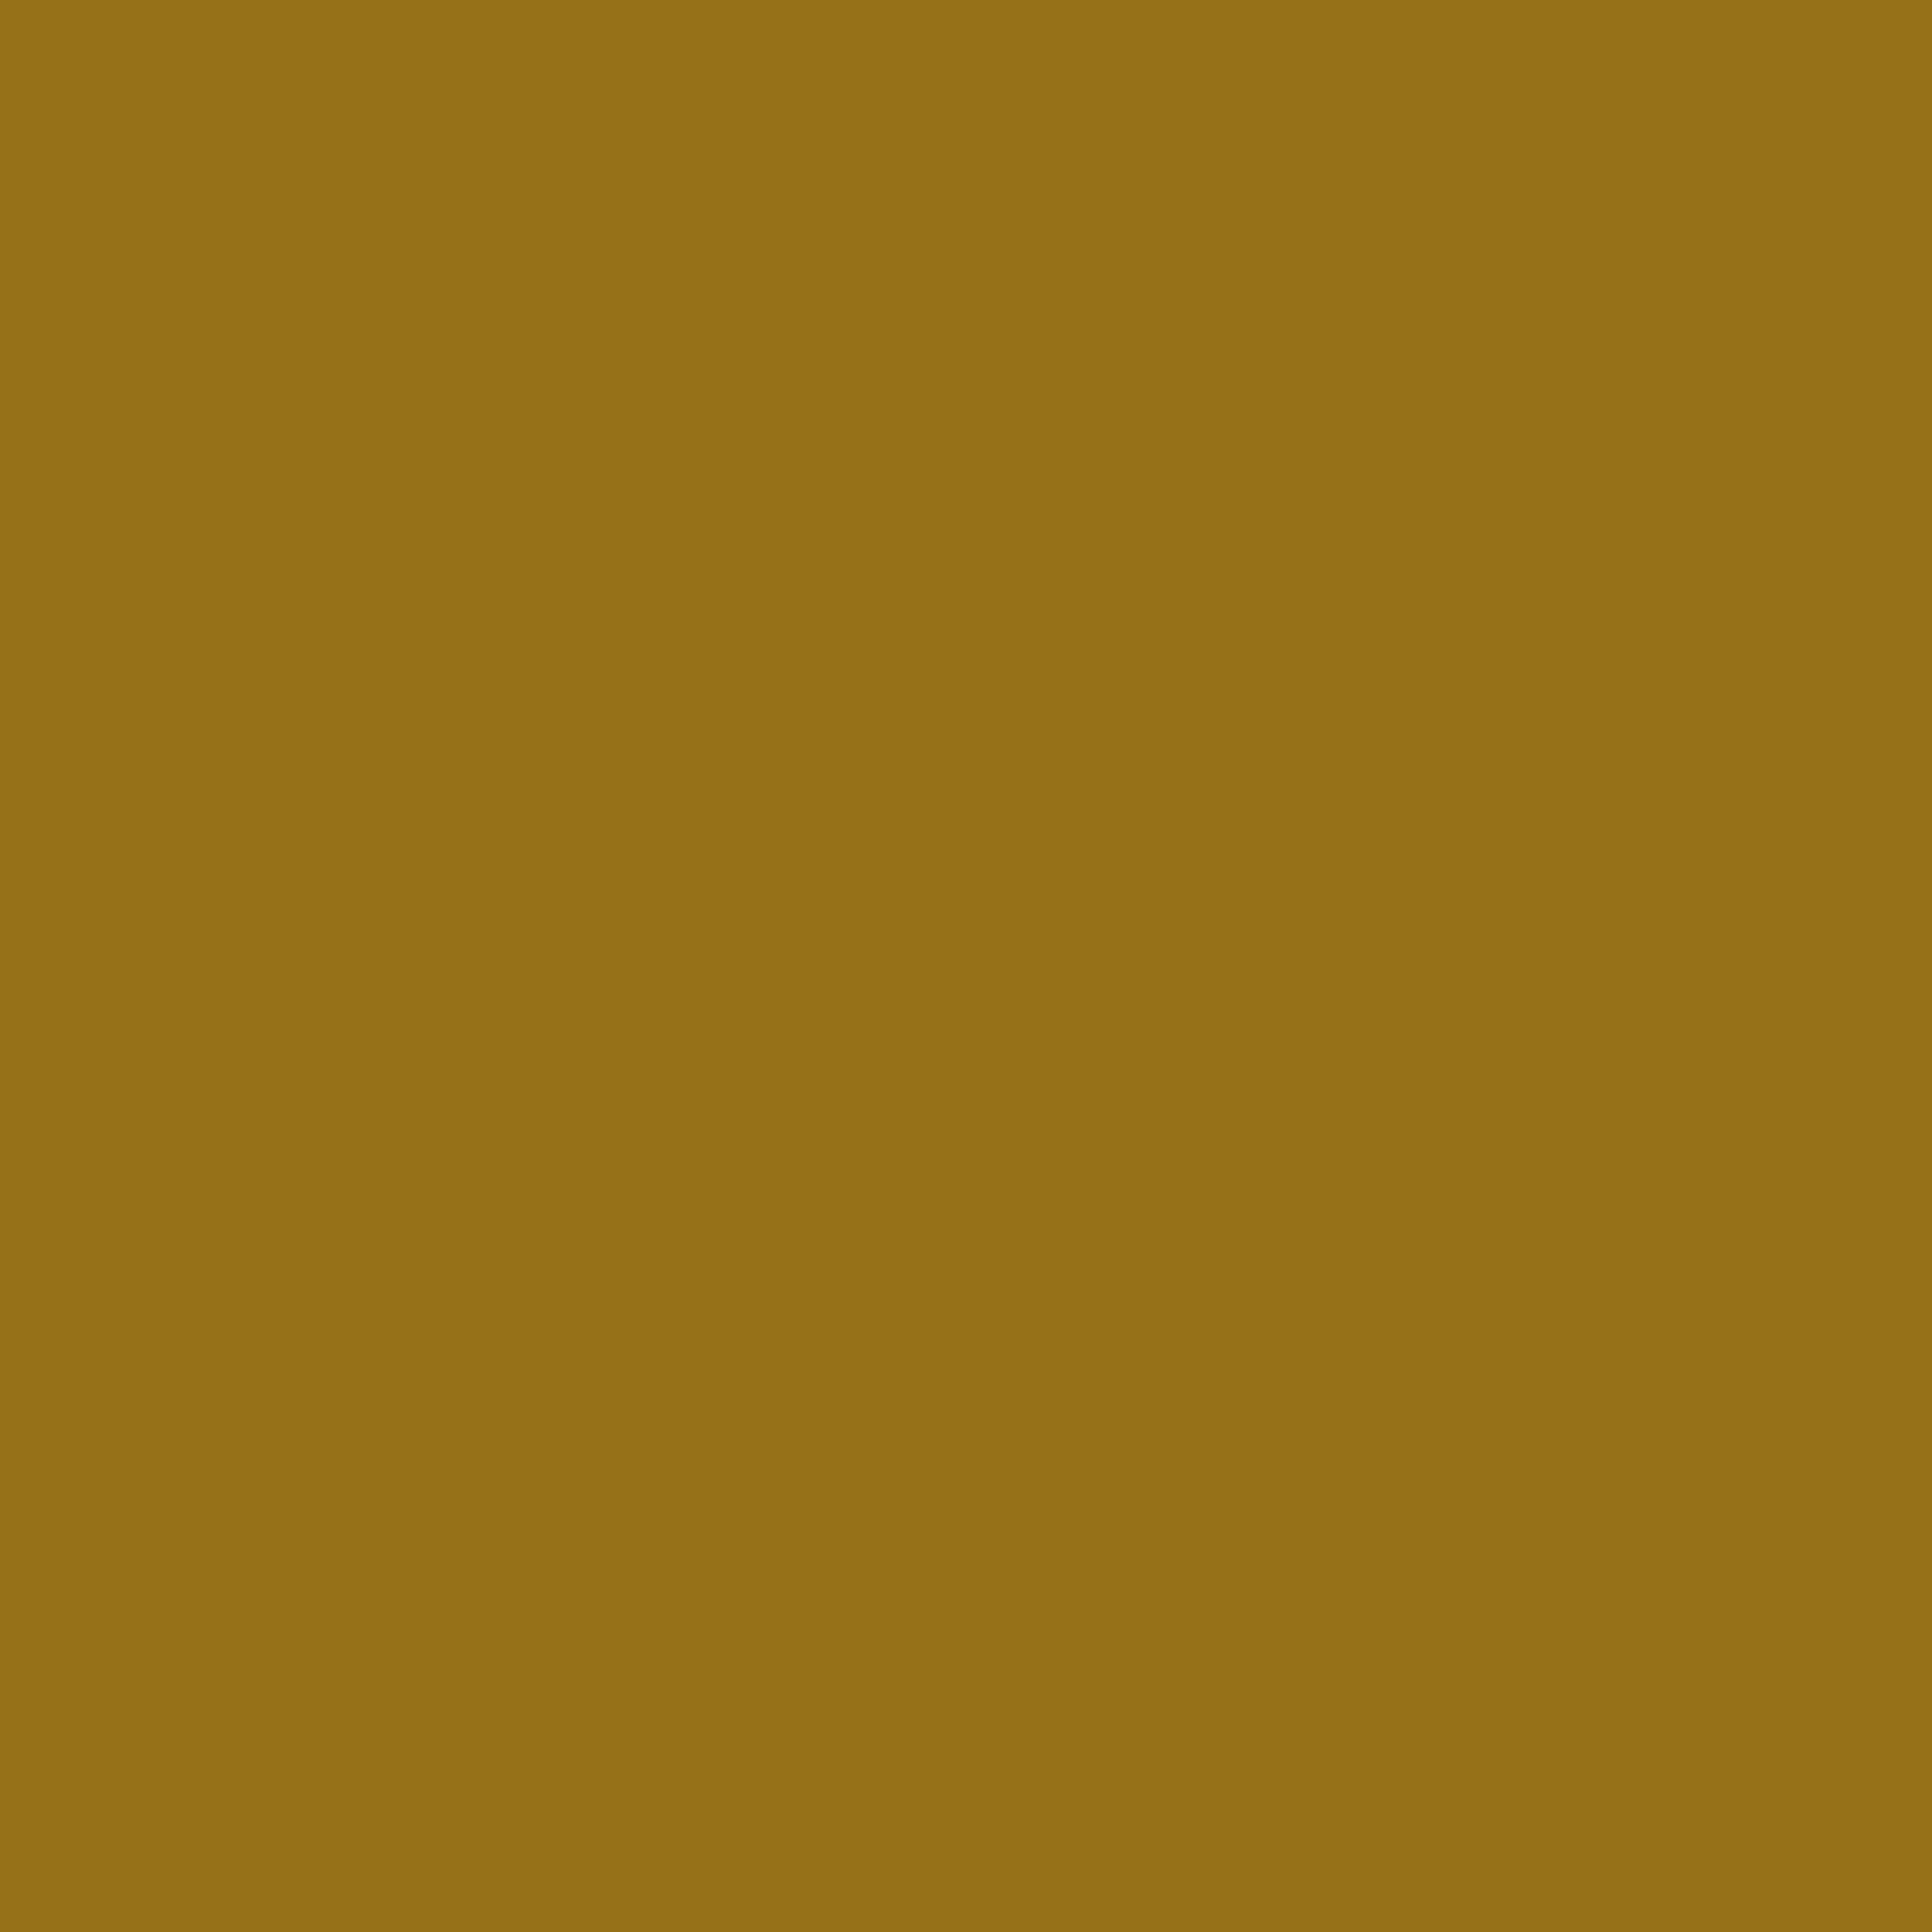 3600x3600 Mode Beige Solid Color Background